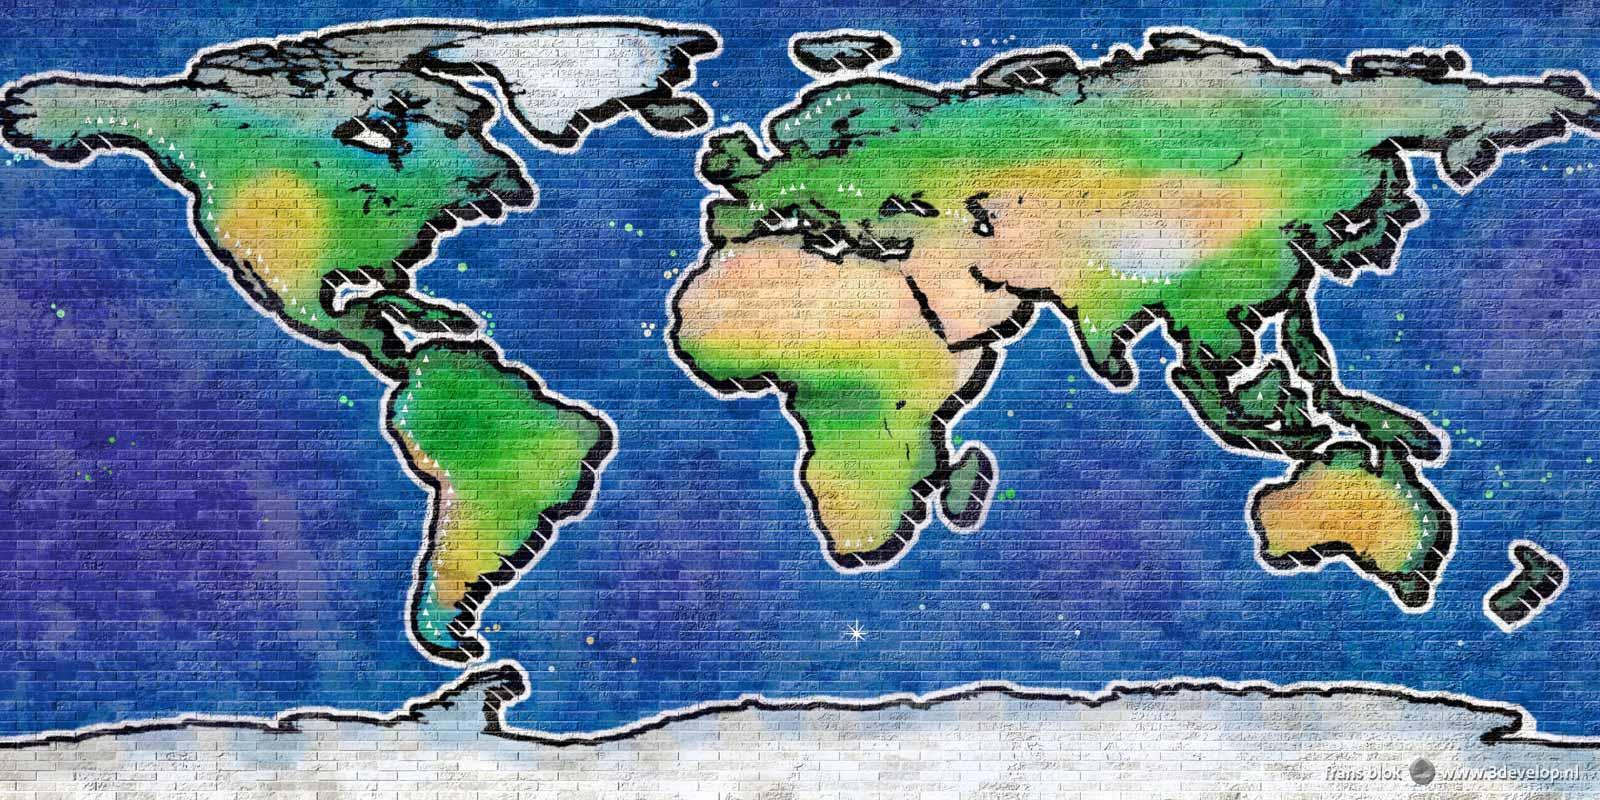 Virtual street art: graffiti world map on a digital 10 x 5 metres brick wall, created in Photoshop